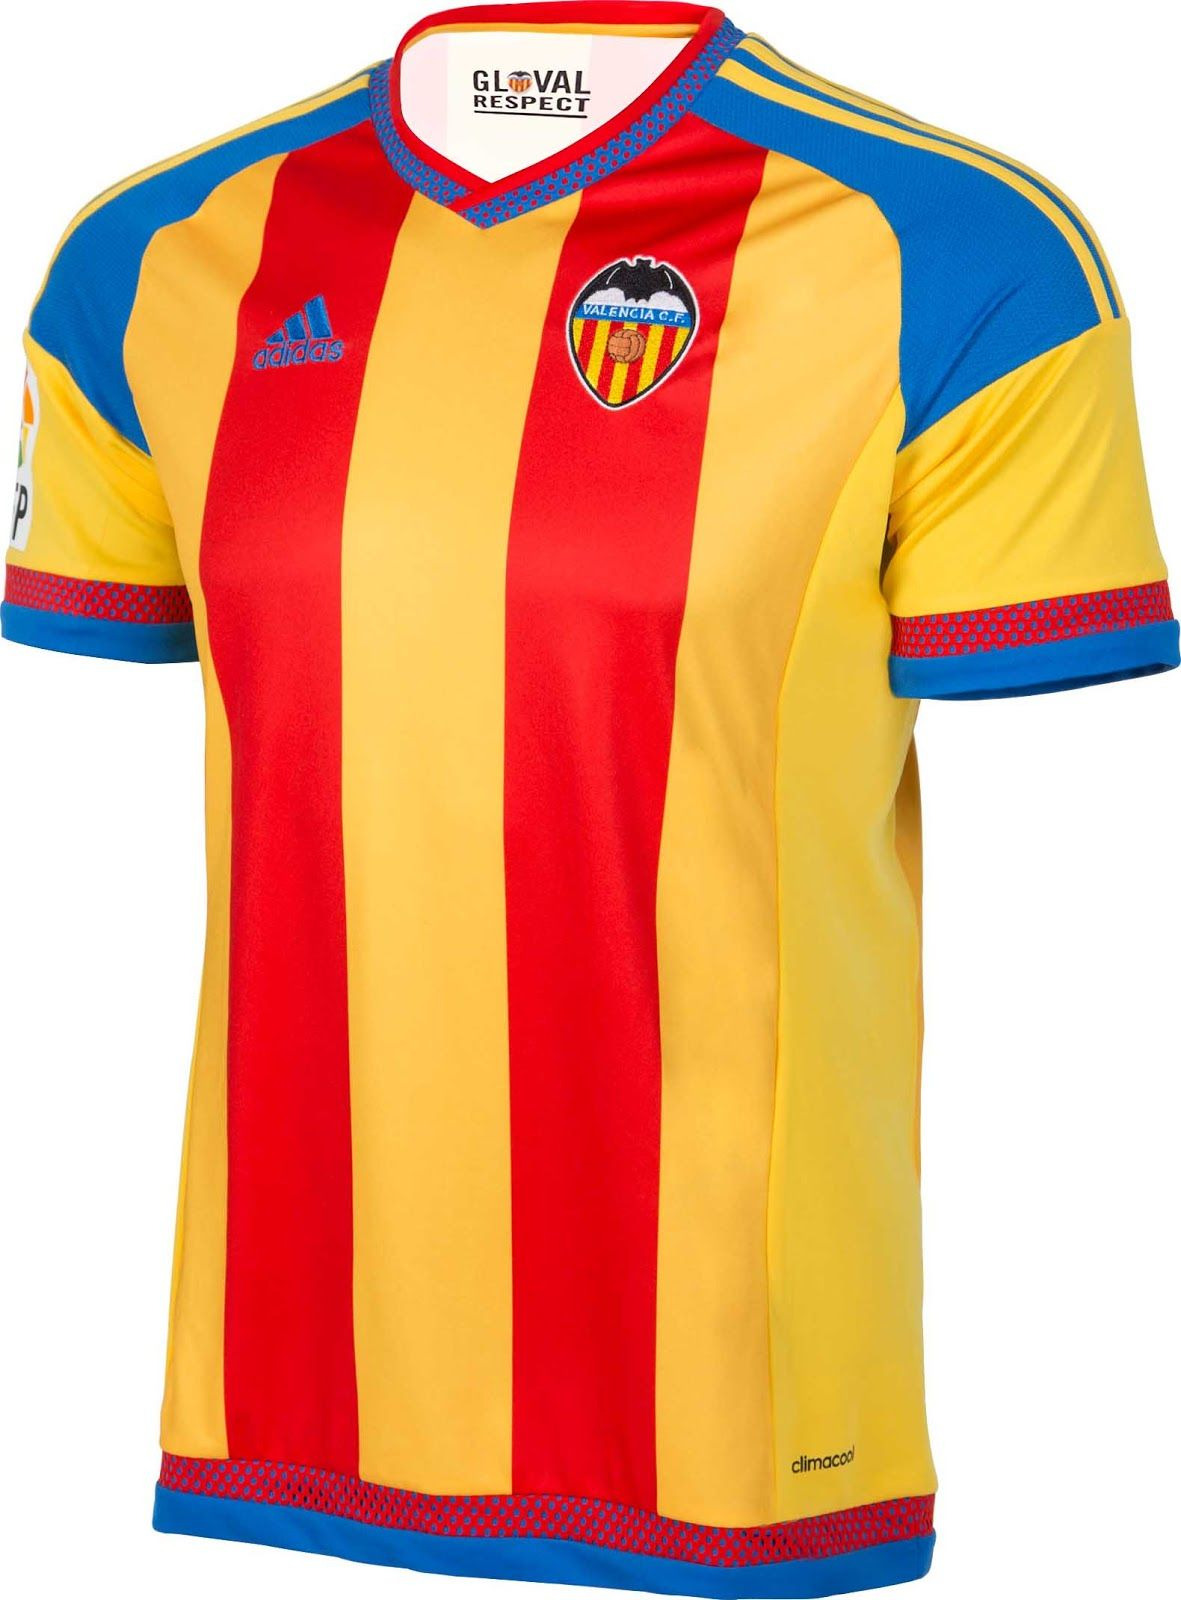 026faa725 Valencia CF (Spain) - 2015 2016 Adidas Away Shirt